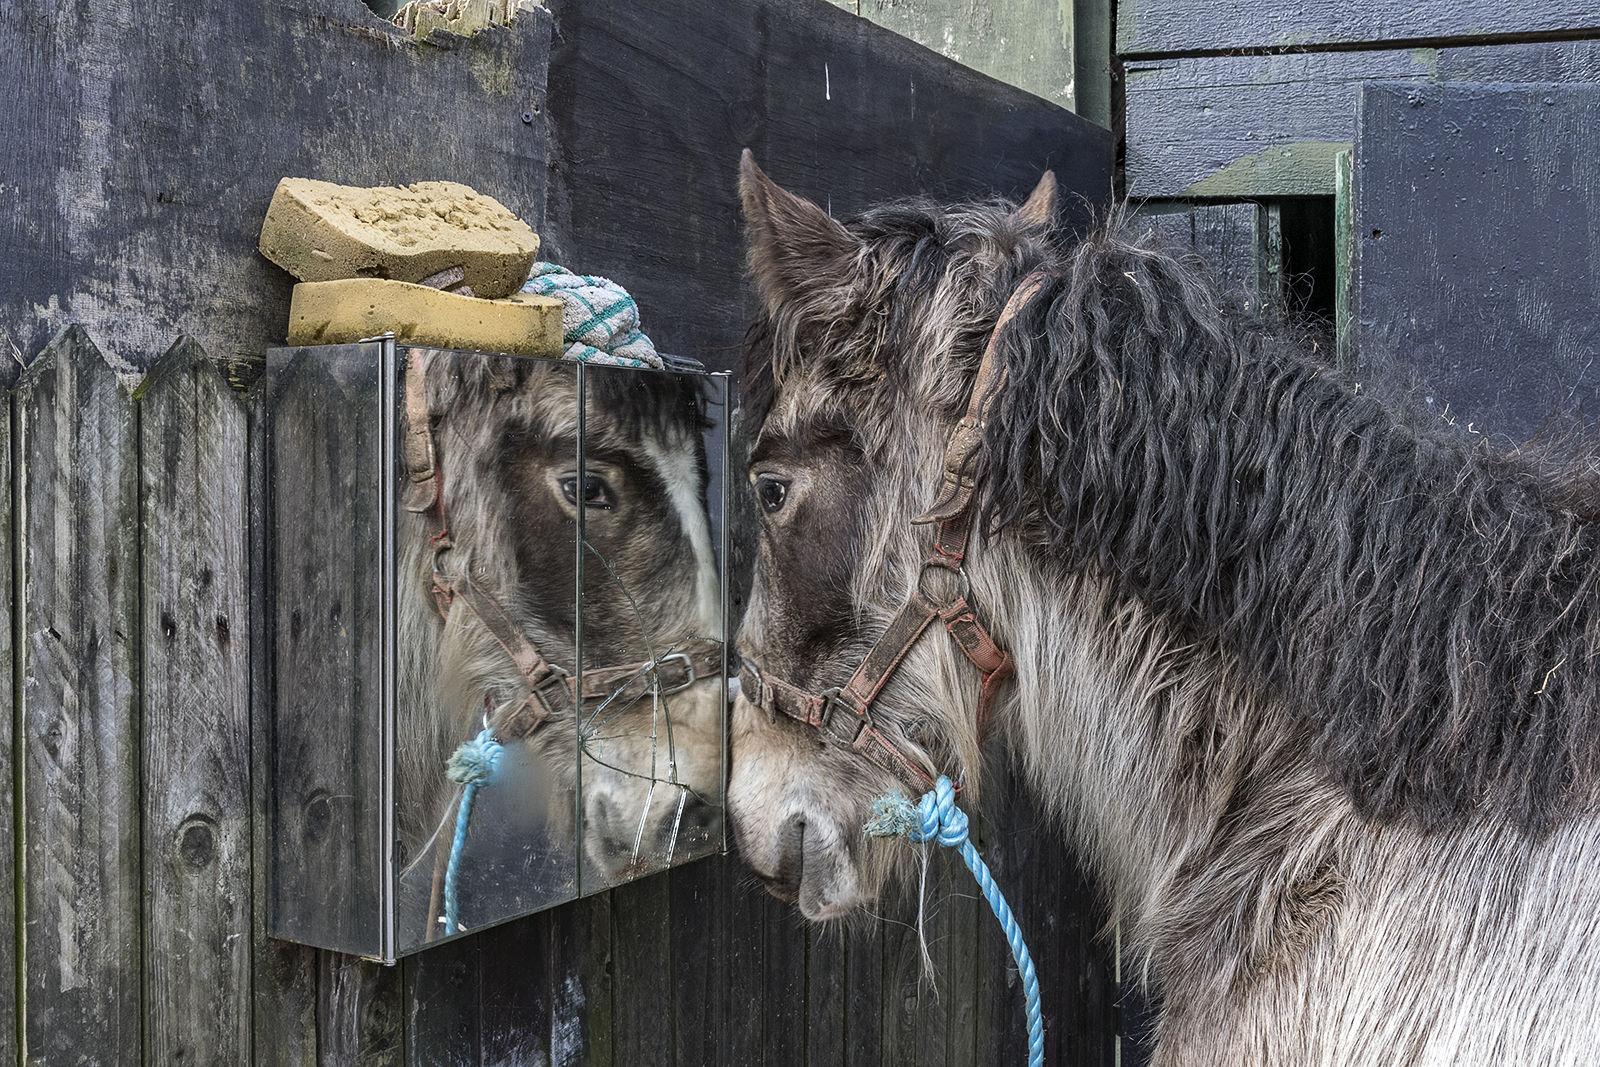 Horse Reflection, Cork, Ireland 2020